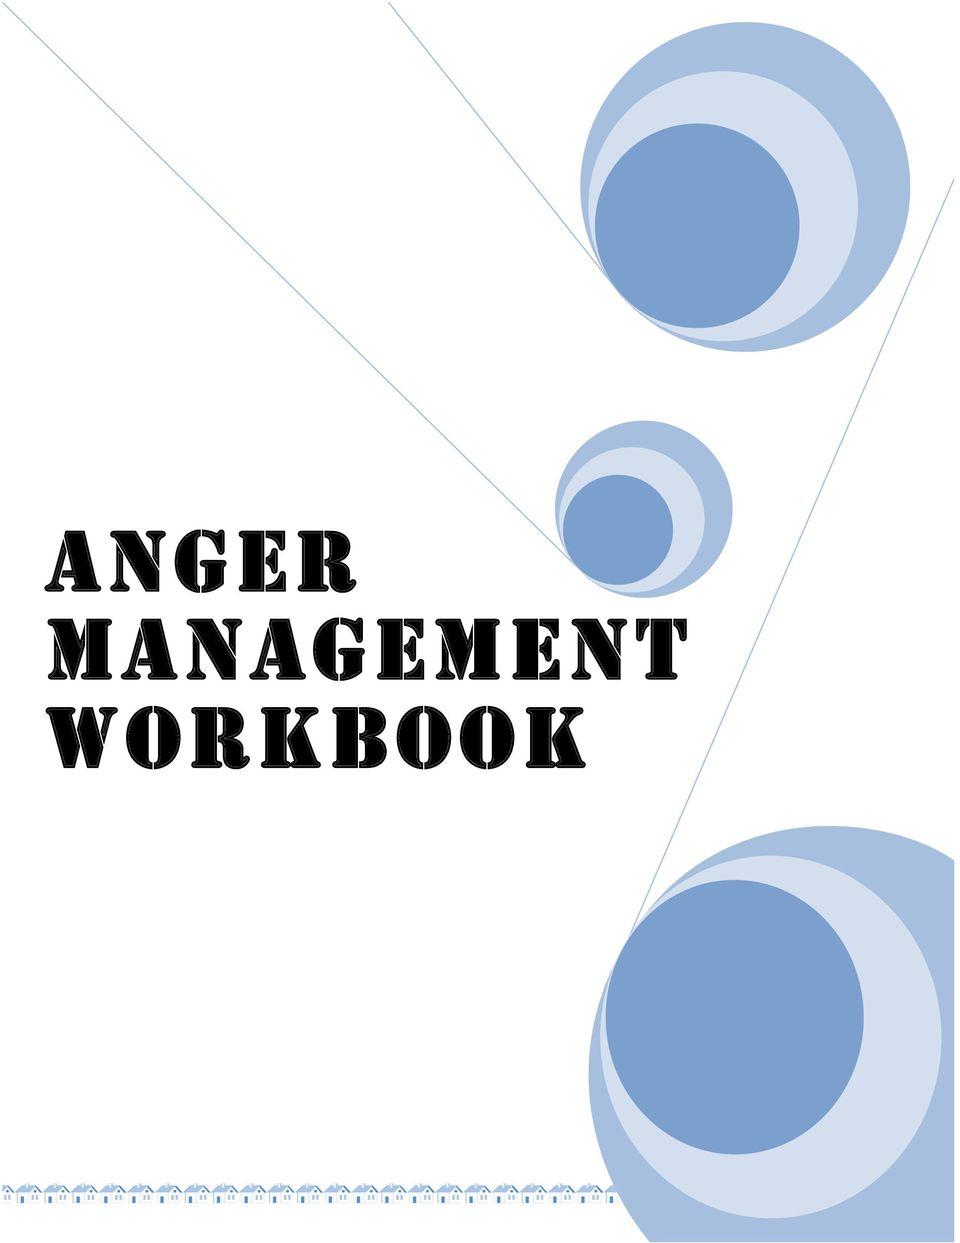 Anger Management Workbook Pdf Free